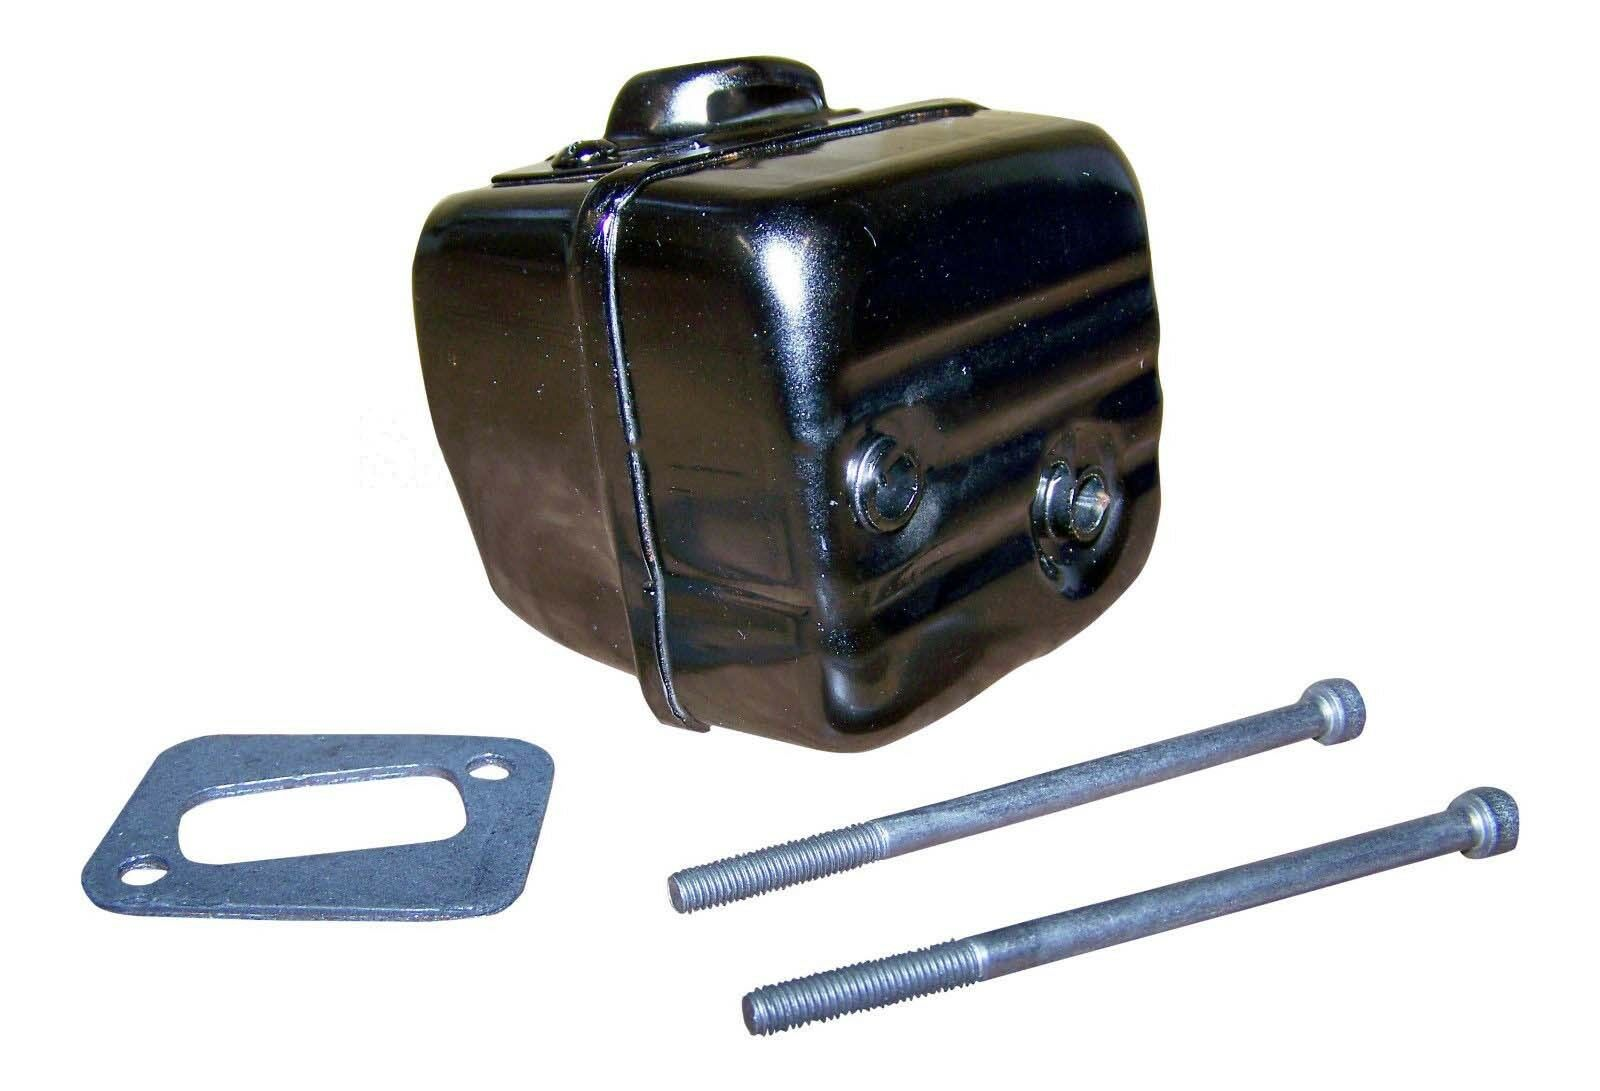 Muffler Support /& Boulon /& Joint fit for HUSQVARNA 350 353 346 XP 345 340 Tronçonneuse